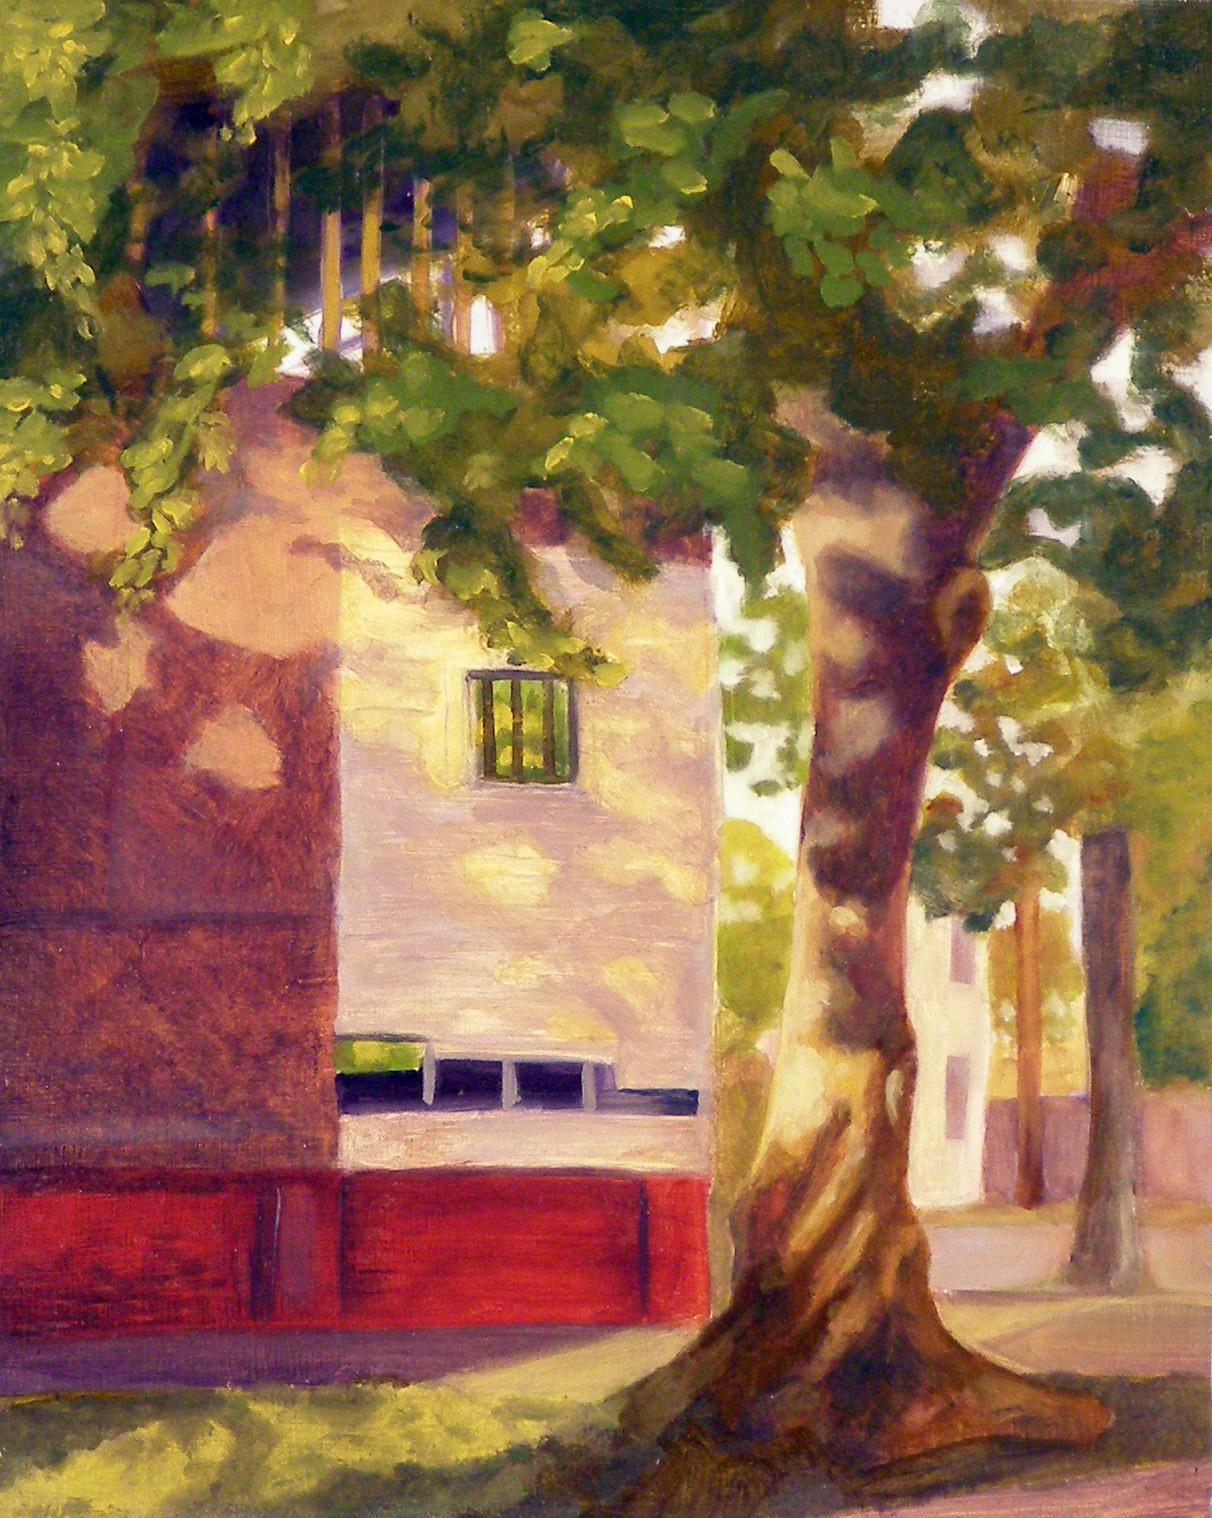 "W. Huntingdon, 8x10"", oil on panel, 2005"